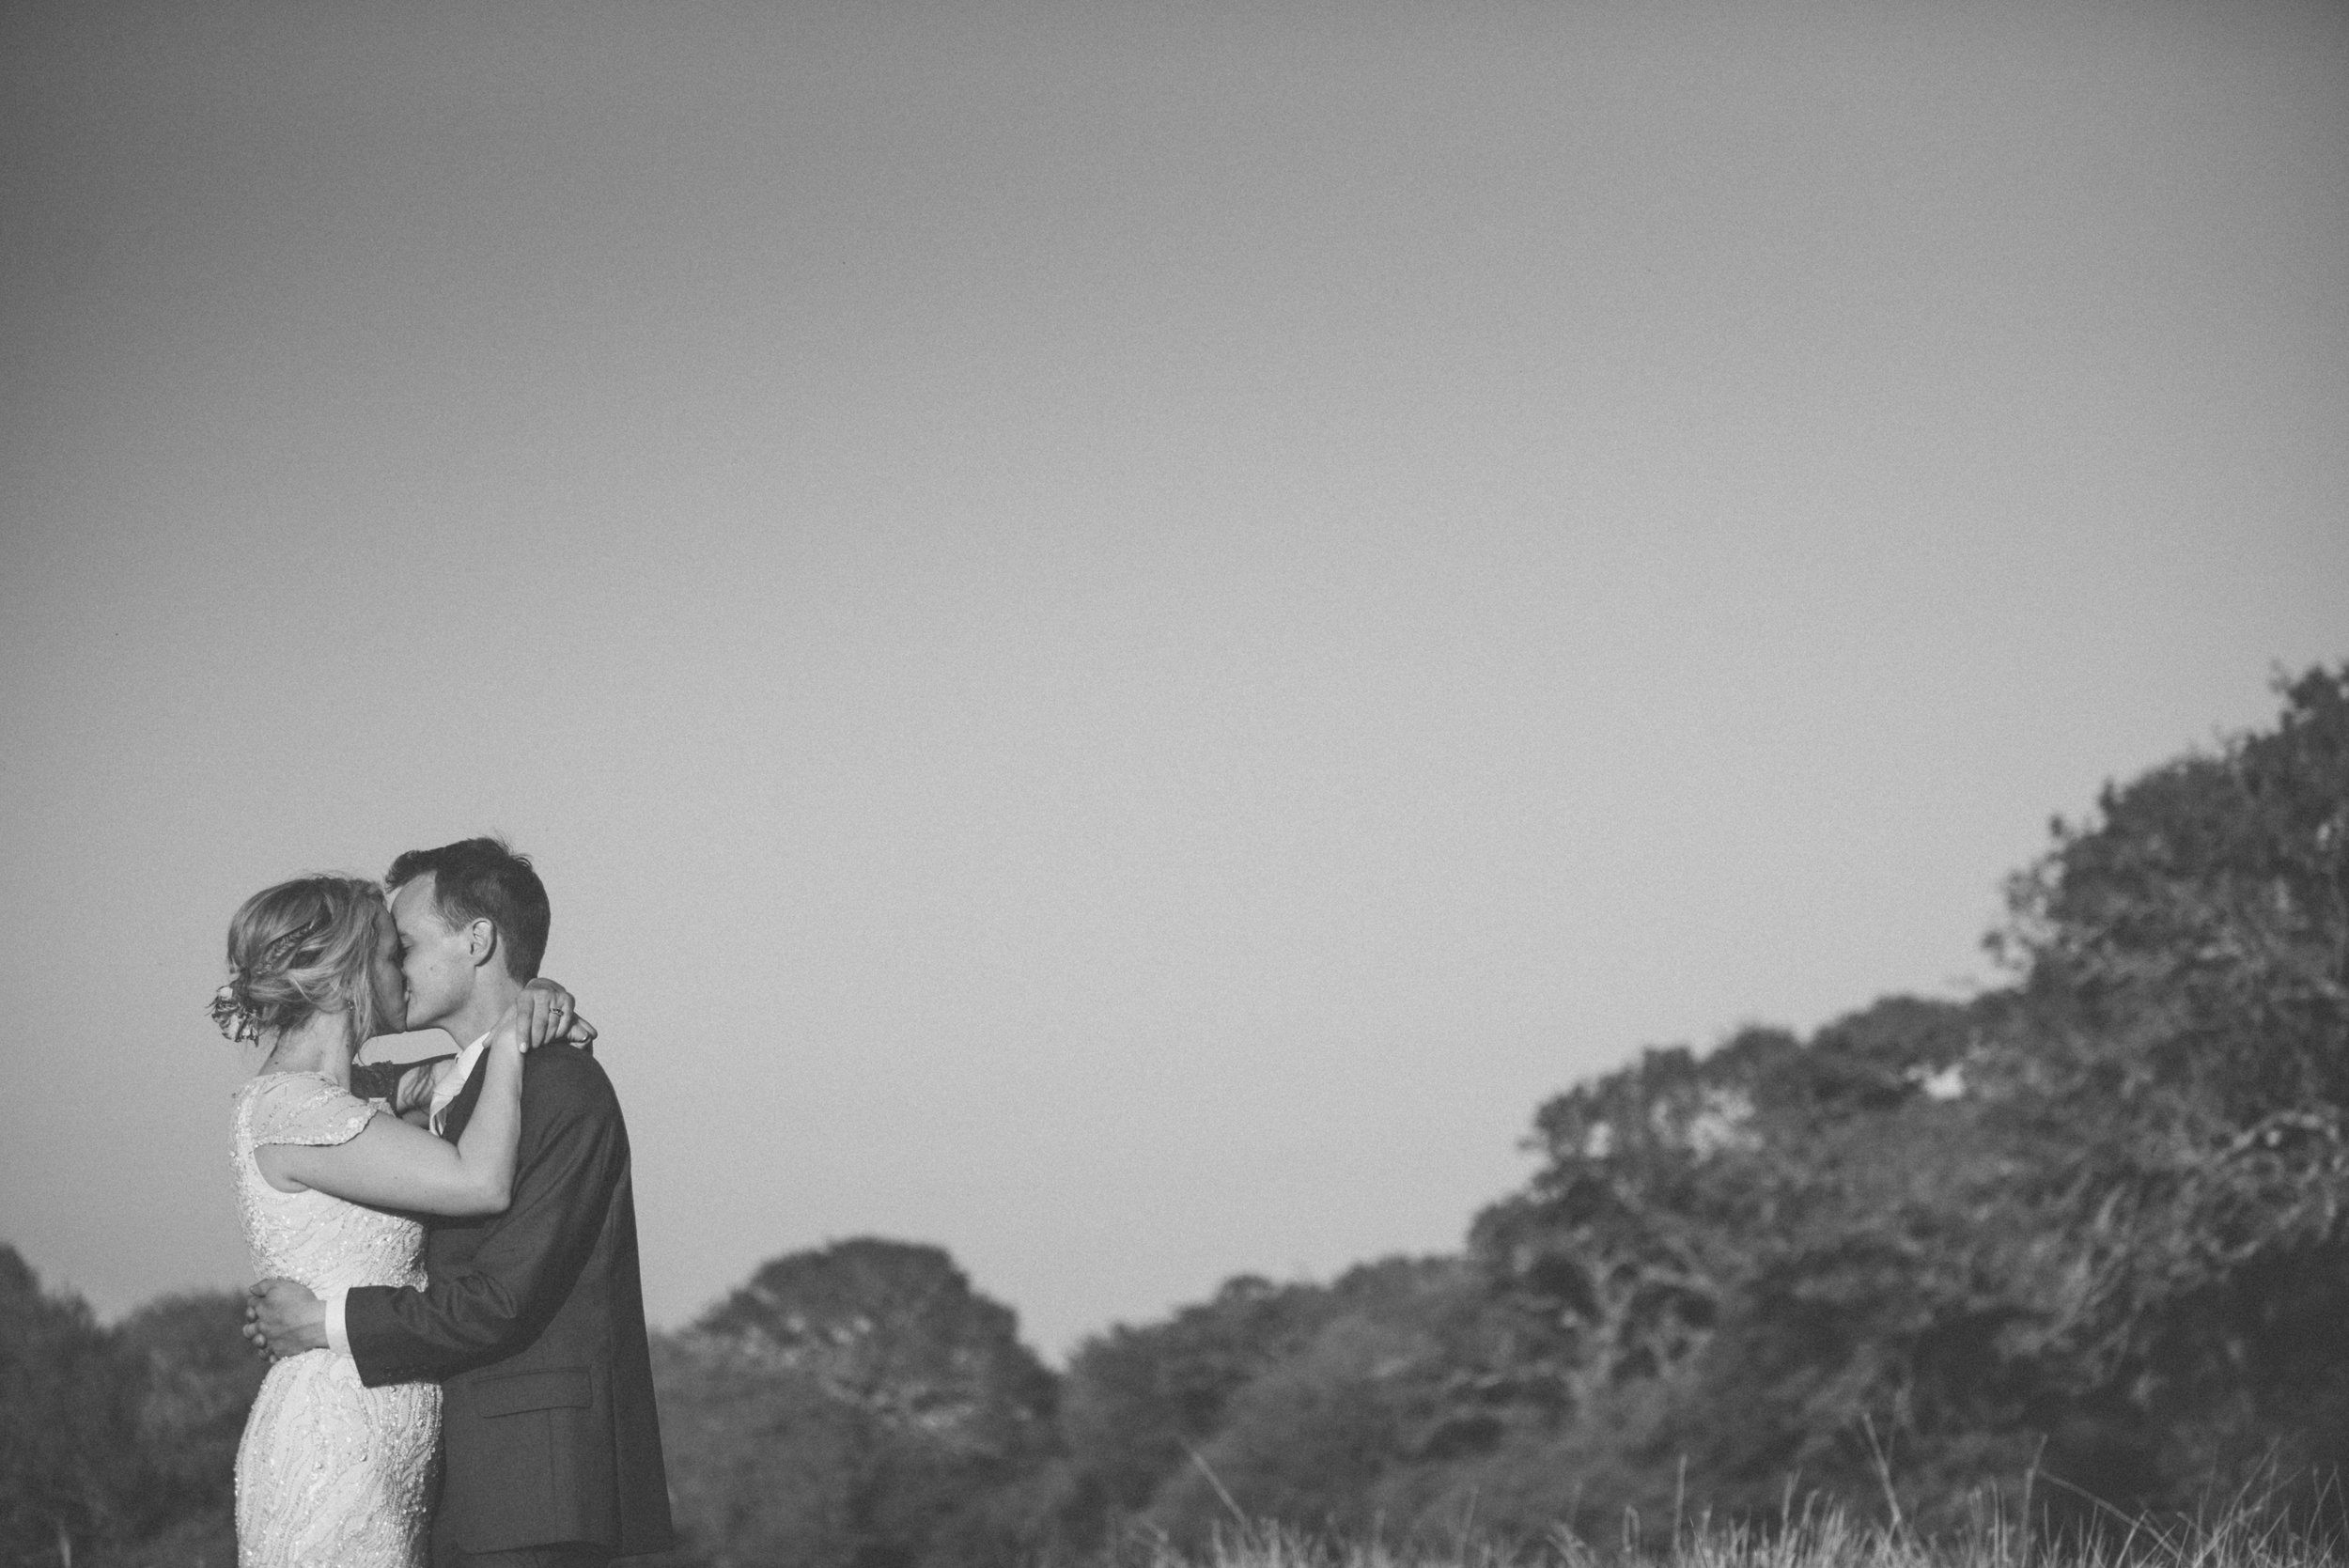 nancarrow-wedding-photography-66.jpg